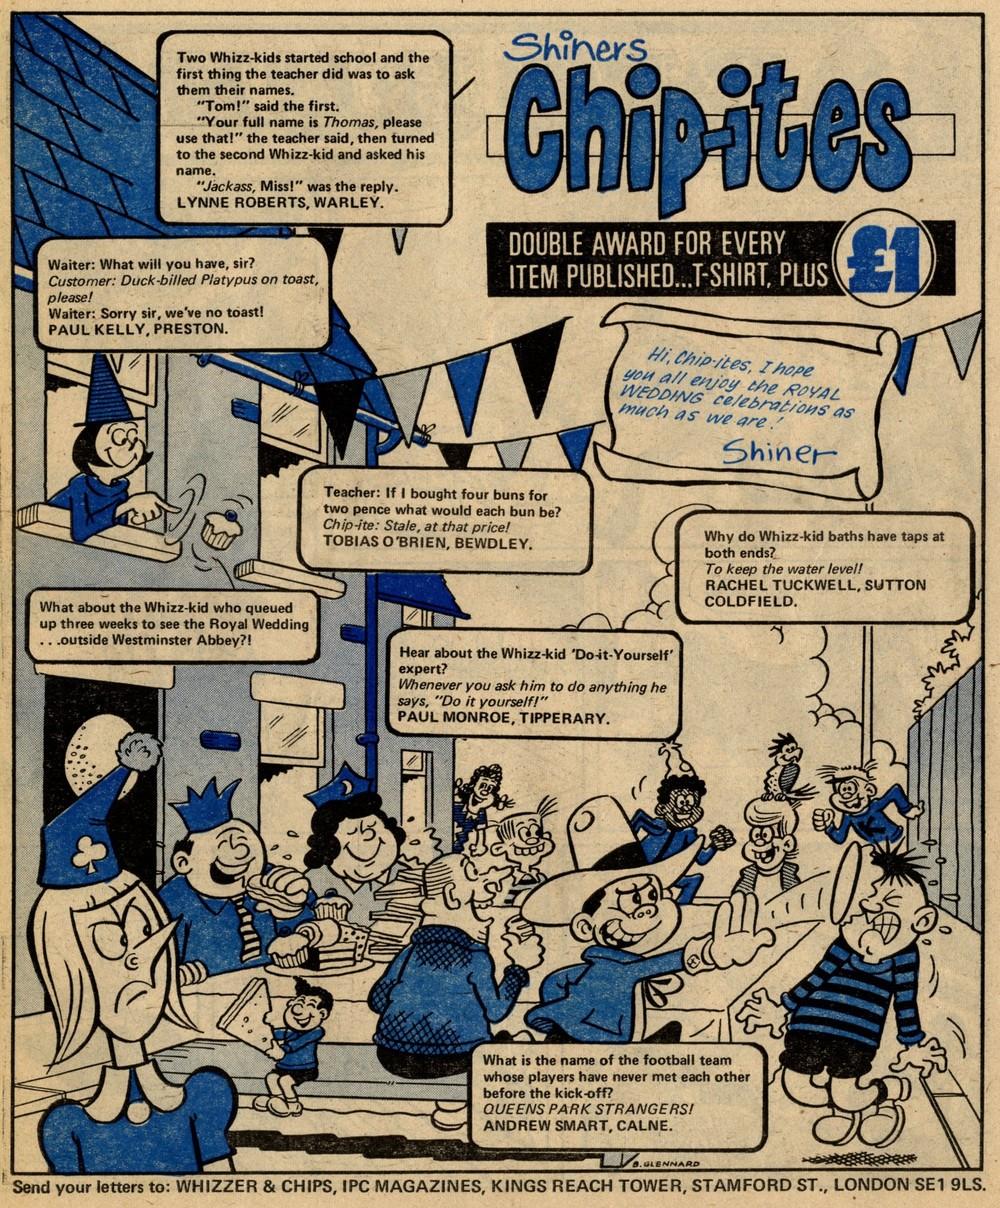 Shiner's Chip-ites: Barry Glennard (artist)